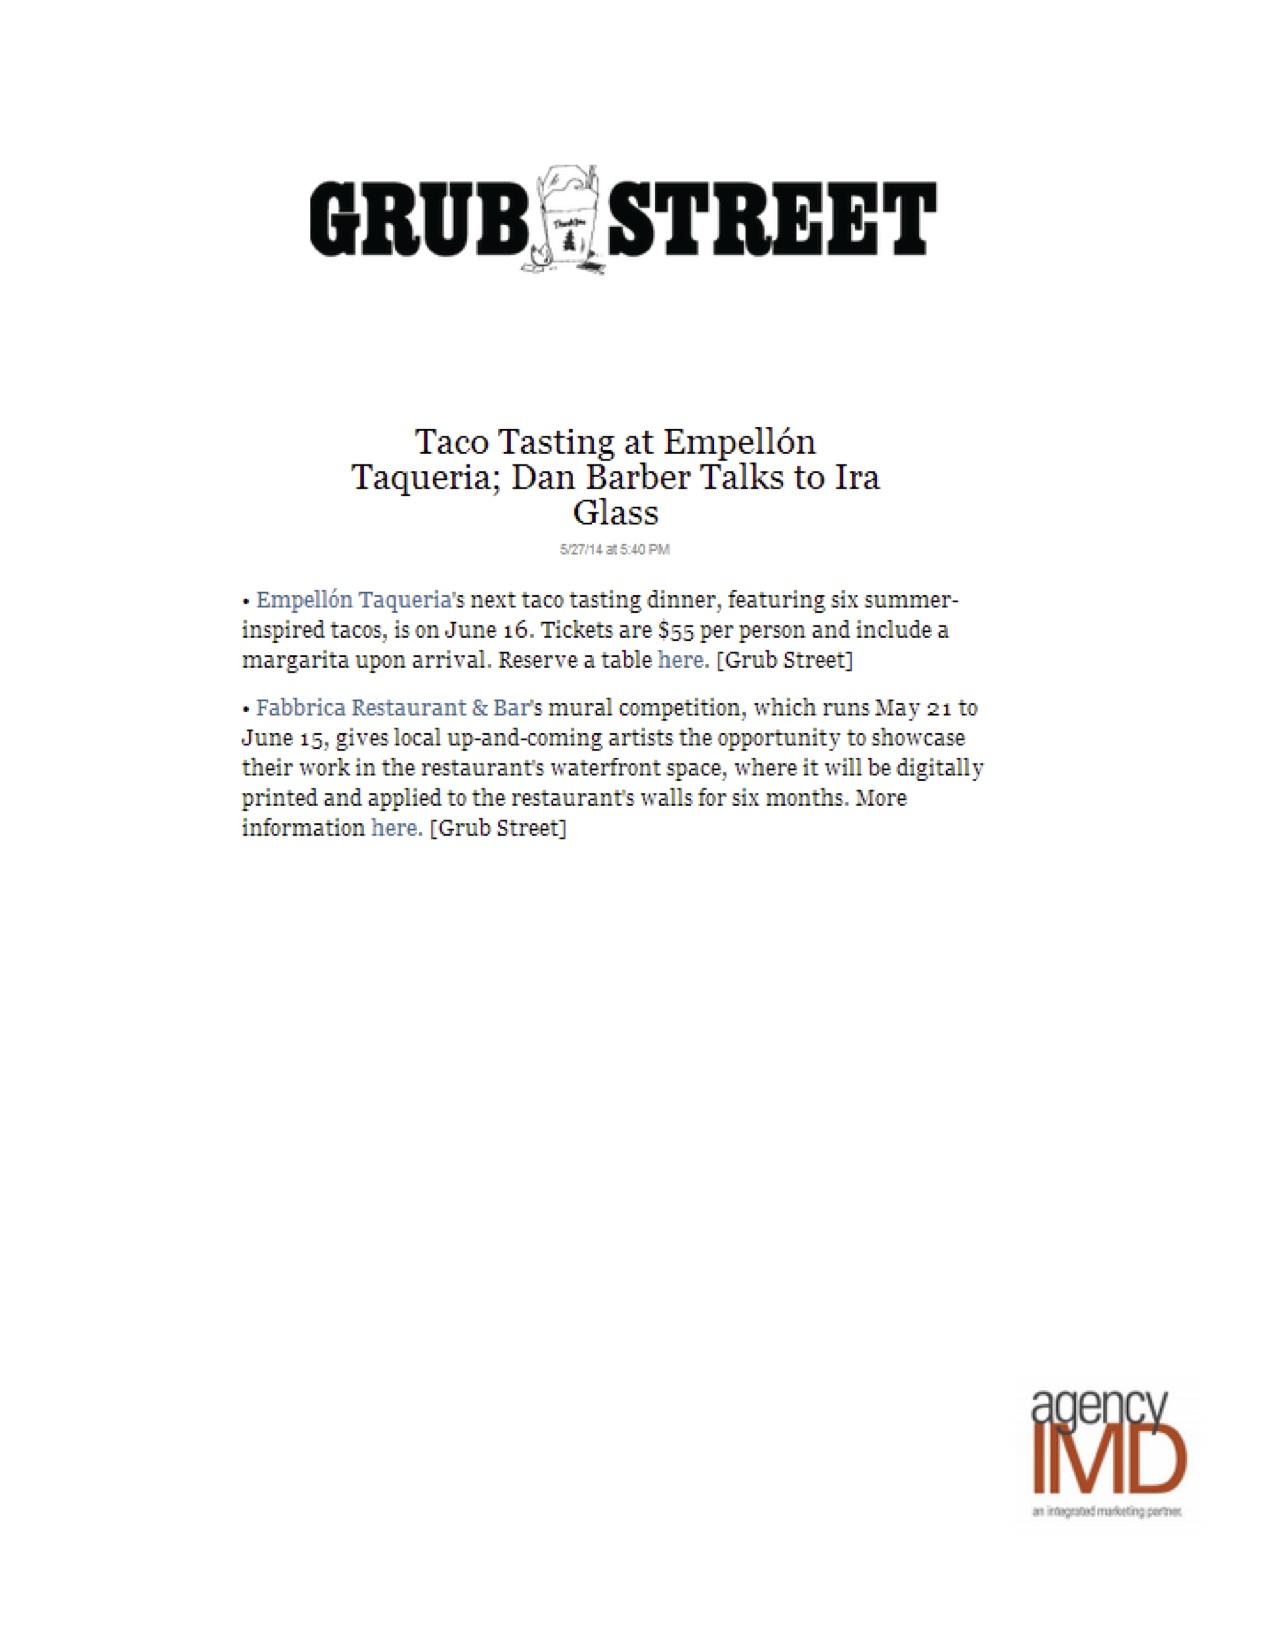 Fabbrica-Grubstreet-June1,2014.jpg